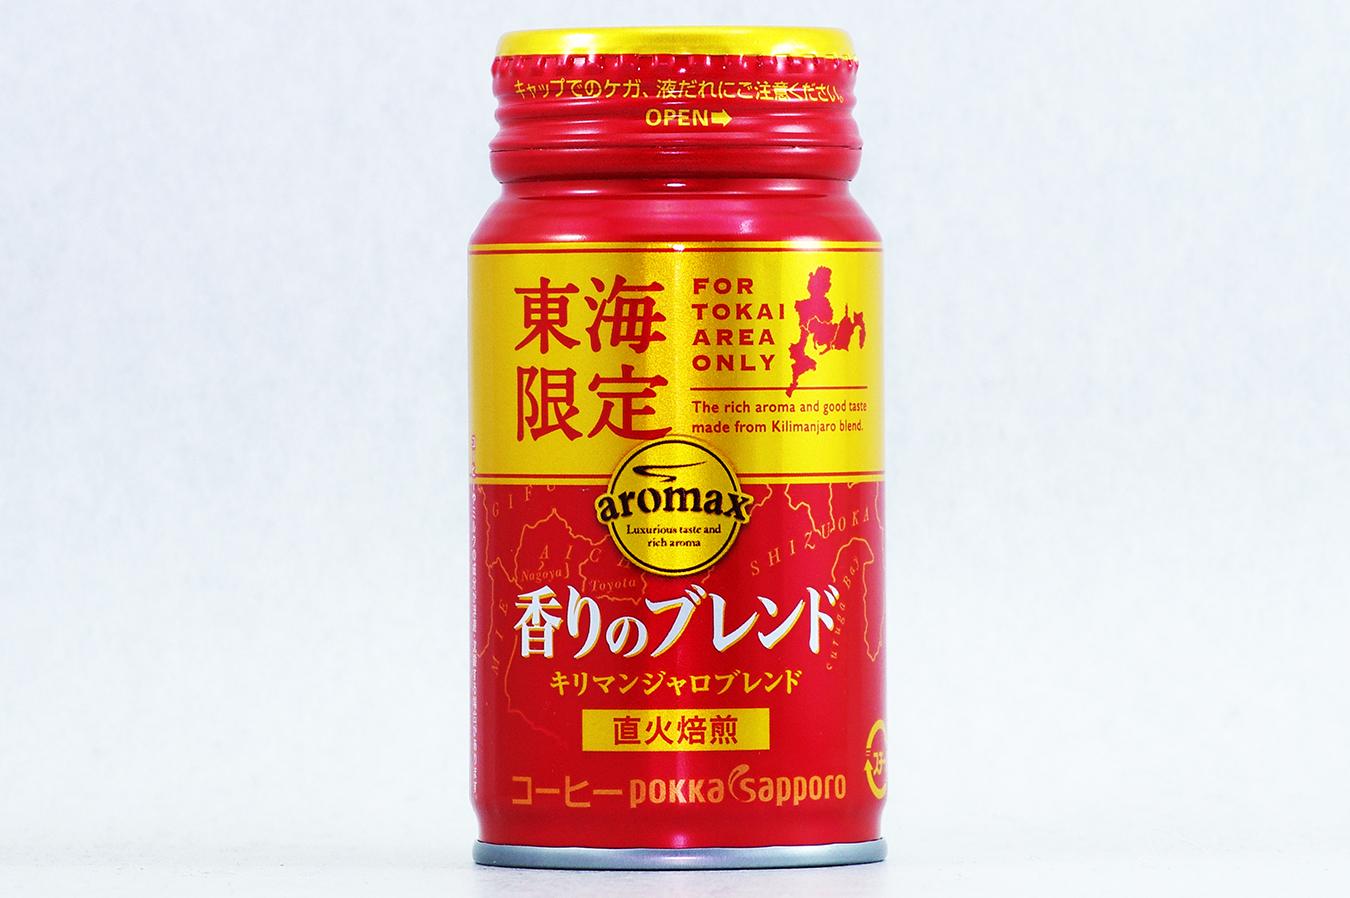 aromax 東海限定香りのブレンド